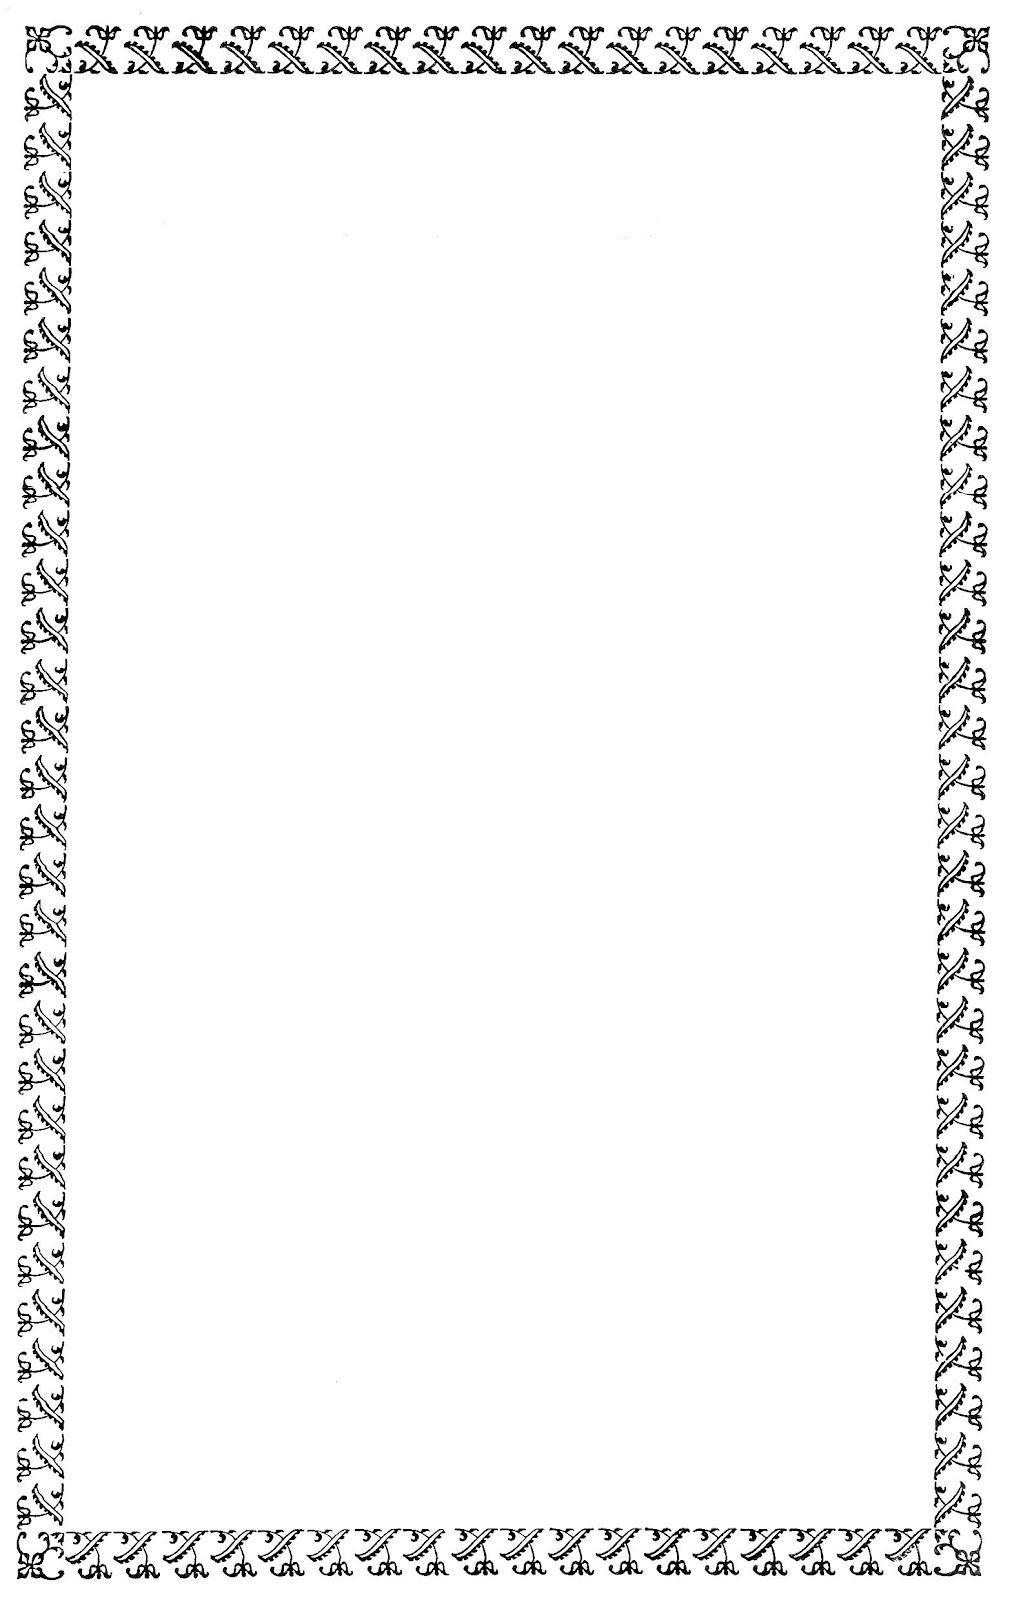 clip art borders frames download - photo #26